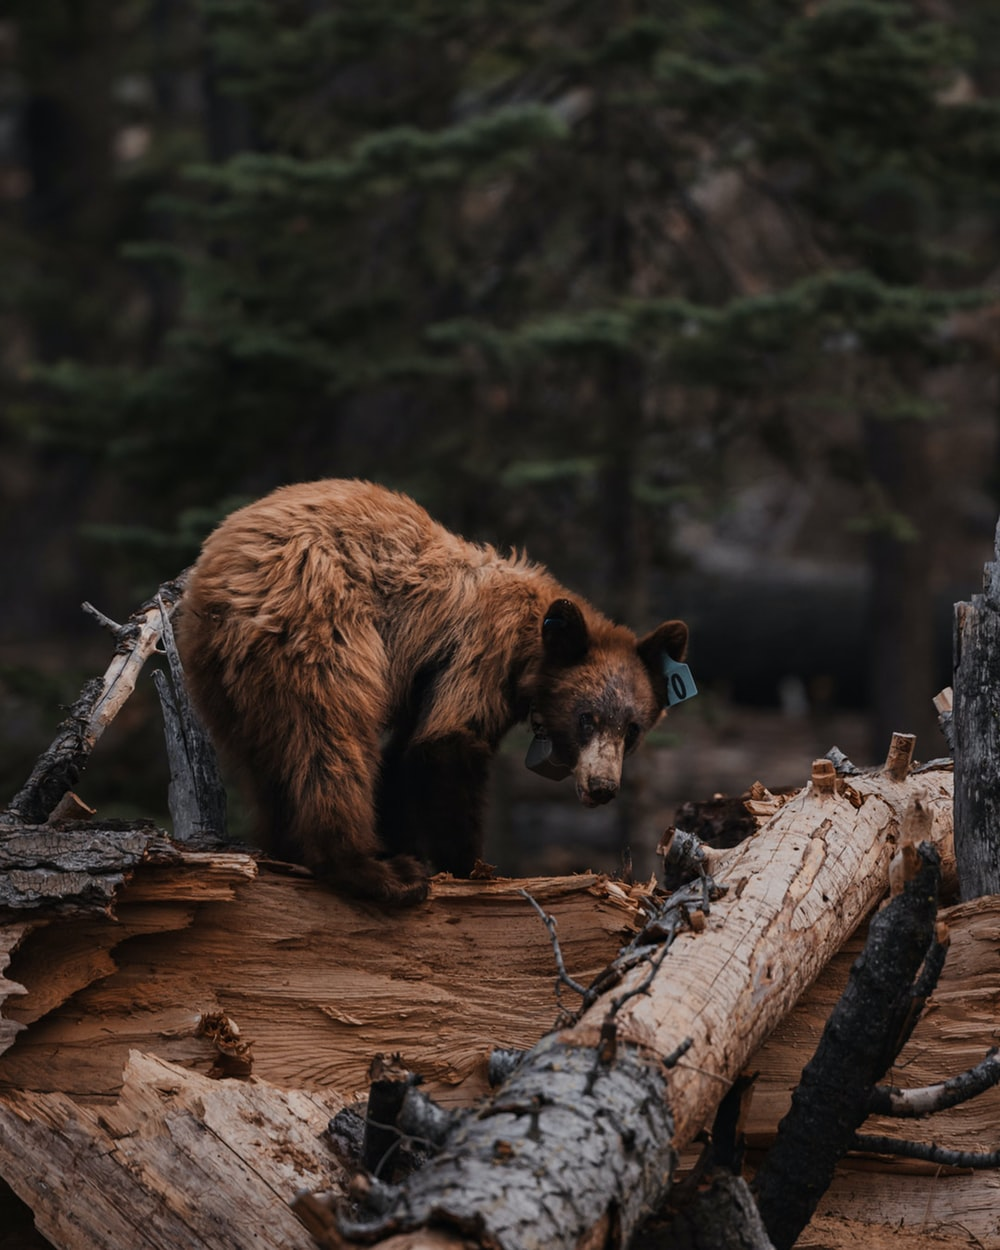 brown bear on brown tree trunk during daytime